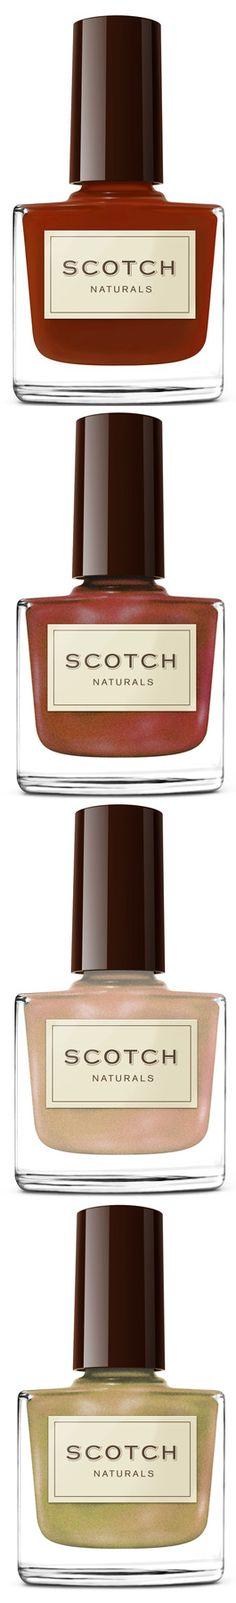 Scotch Nail Polishes! I love their polishes